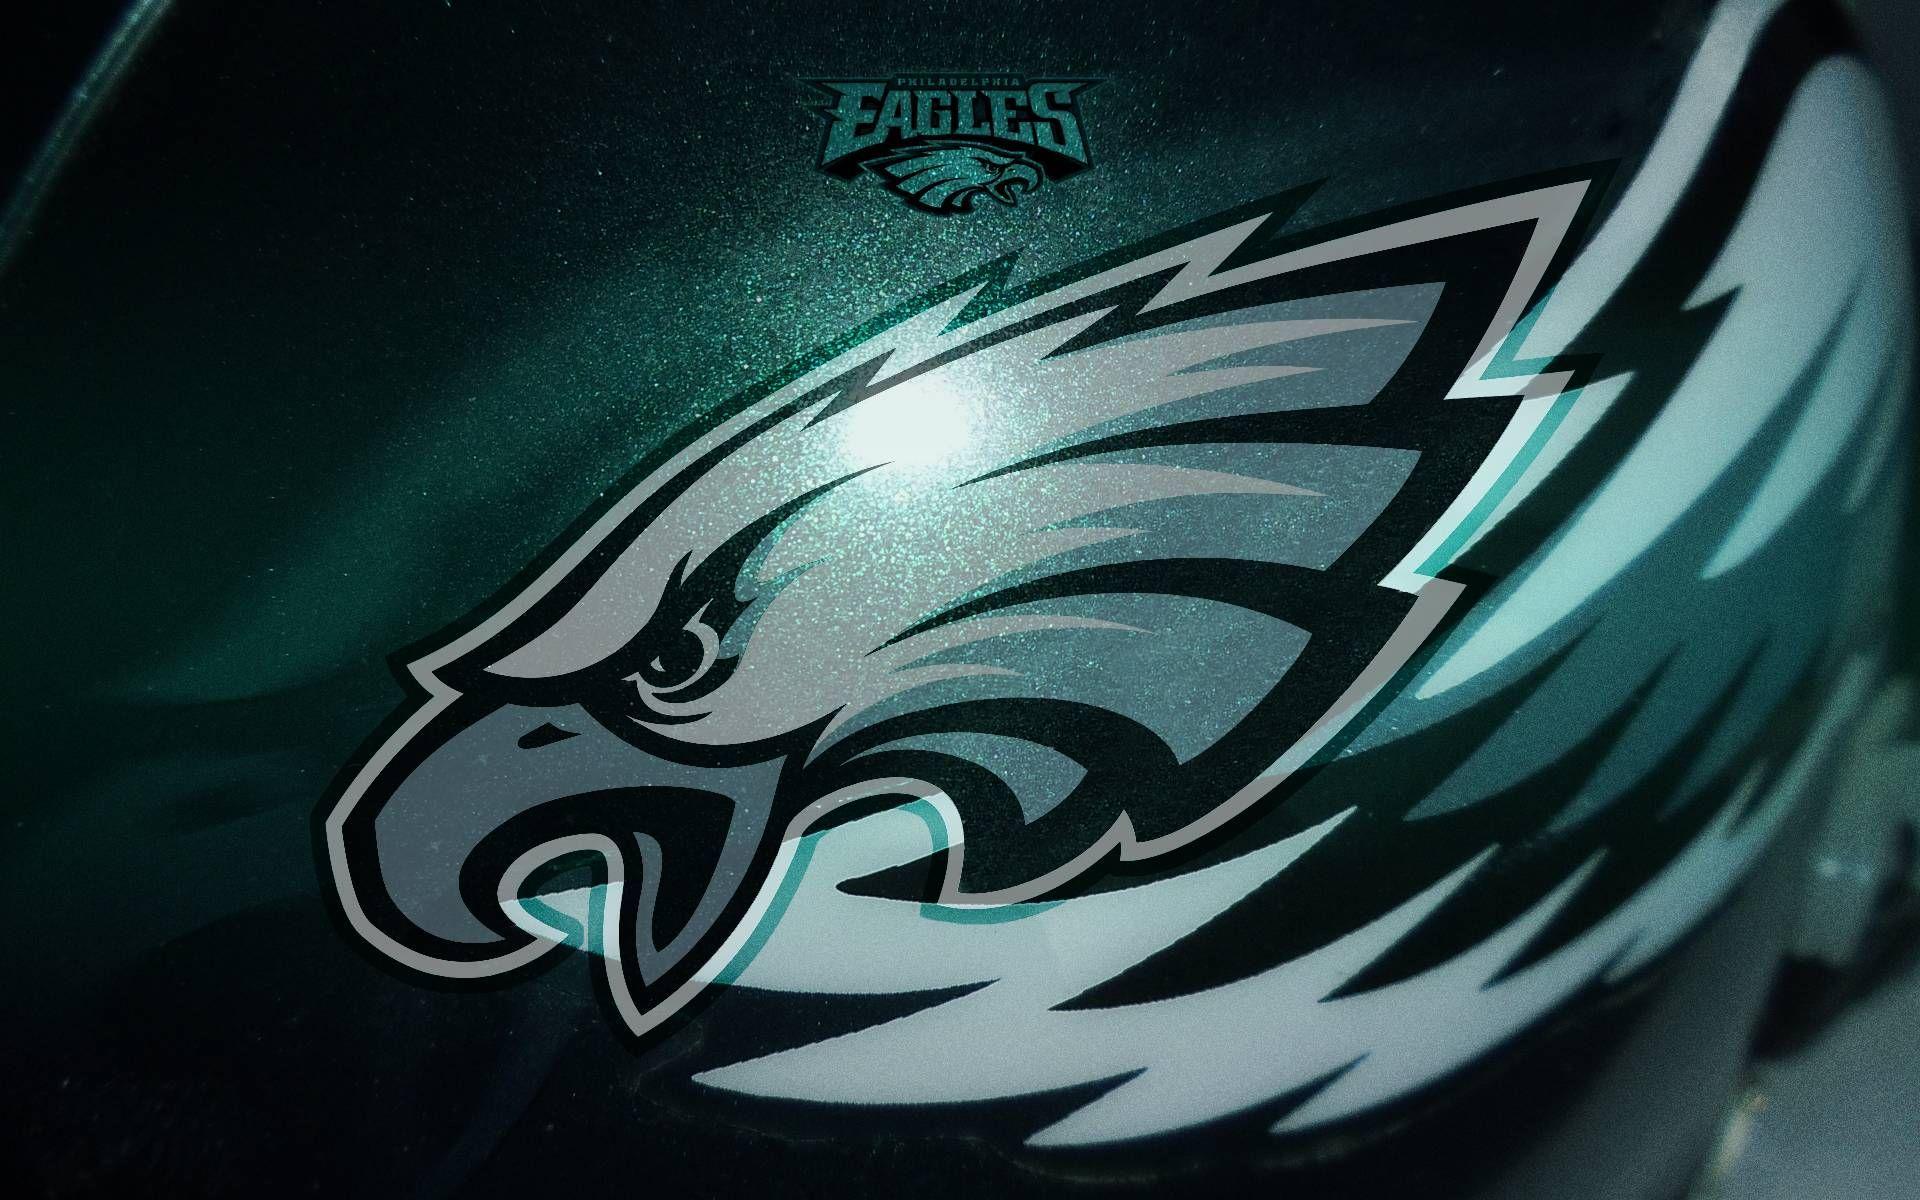 Philadelphia Eagles Iphone Wallpapers 25 Wallpapers 3d Wallpapers Philadelphia Eagles Wallpaper Philadelphia Eagles Logo Philadelphia Eagles